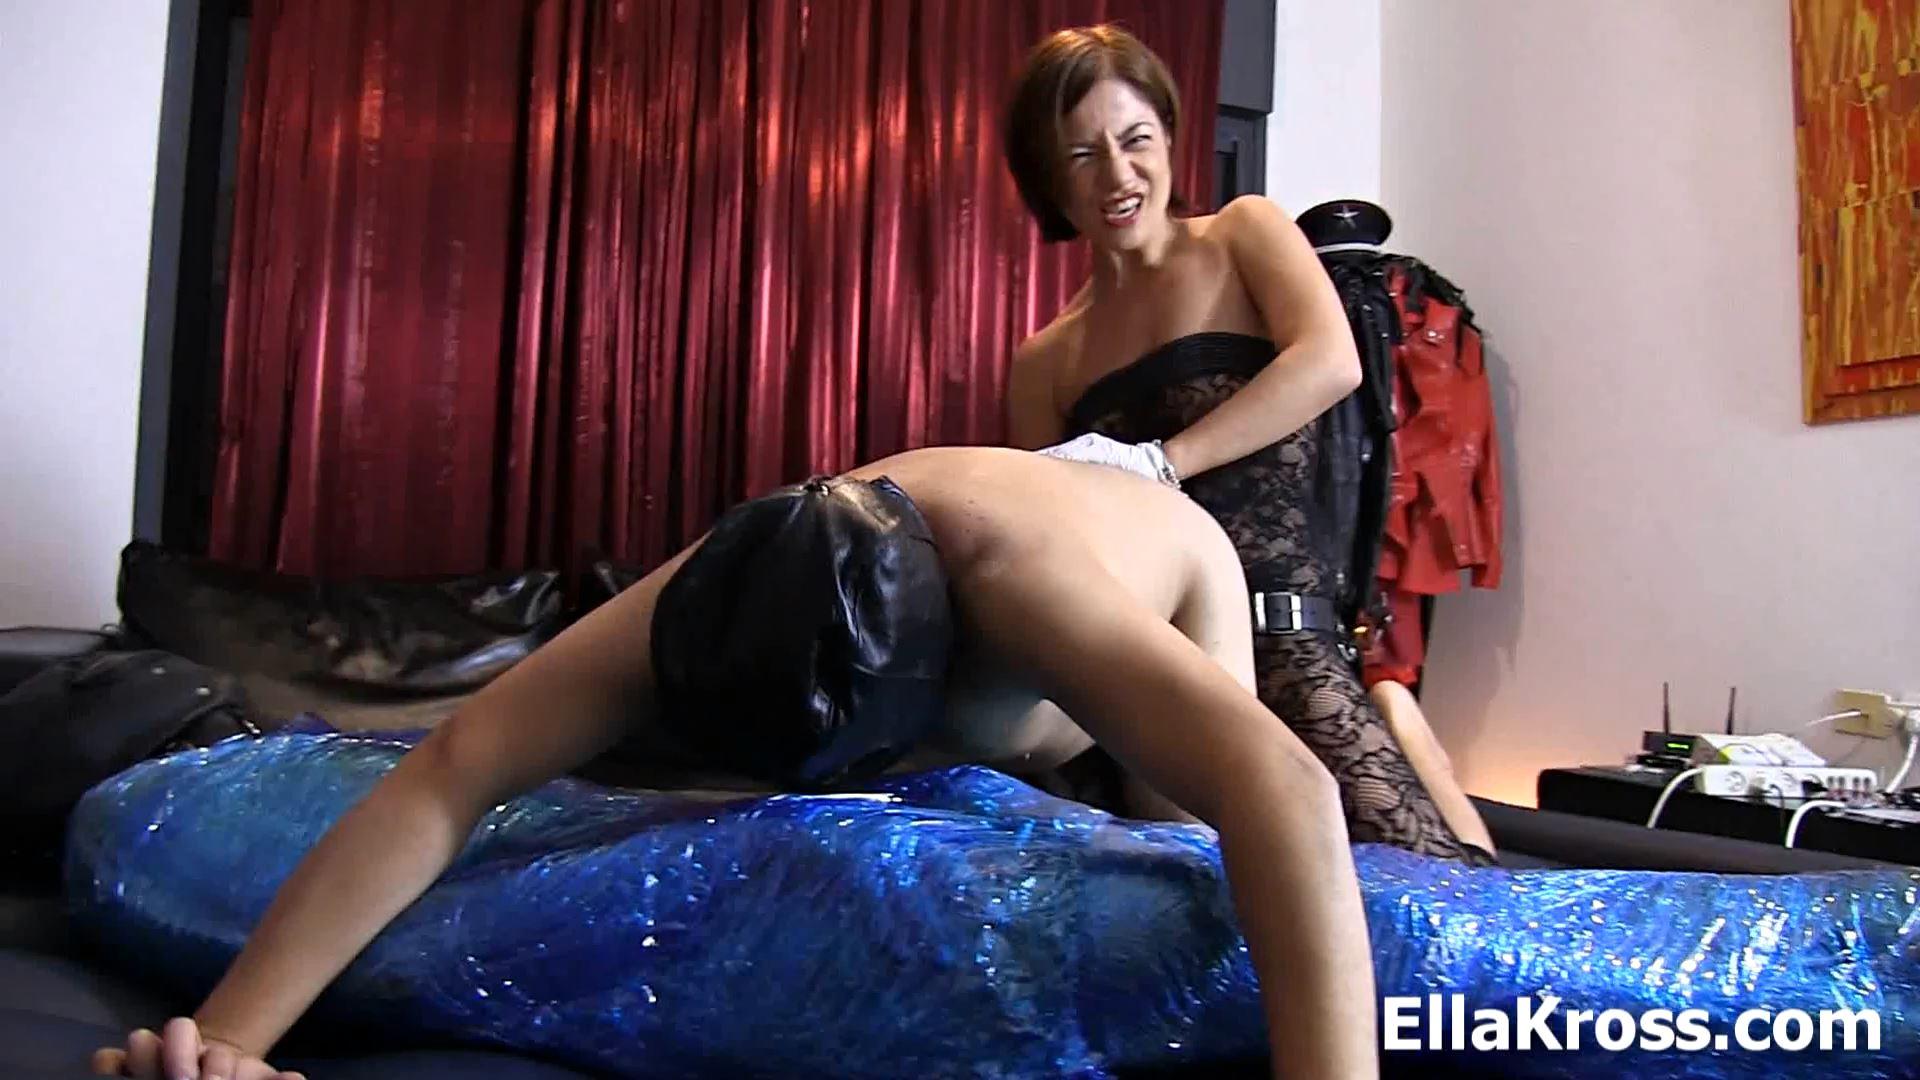 Mistress Ella Kross In Scene: Making a Slave Suck Cock and Fucking His Ass - ELLAKROSS - FULL HD/1080p/MP4